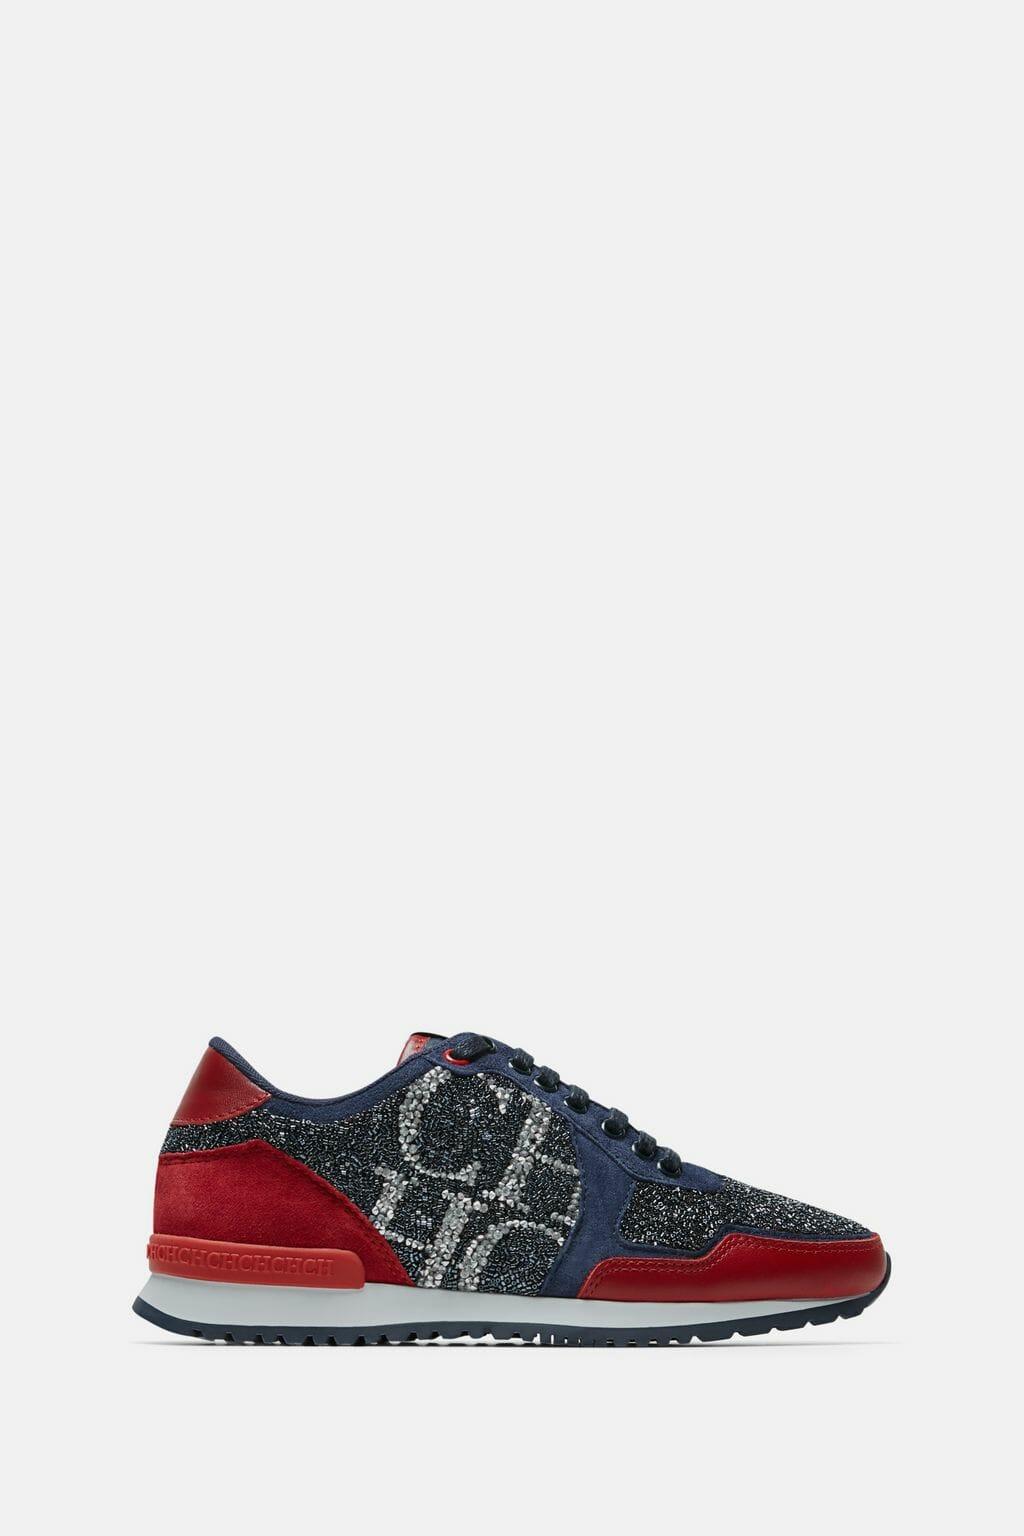 CH-Carolina-herrera-shoes-collection-Spring-Summer-2018-shoe-83